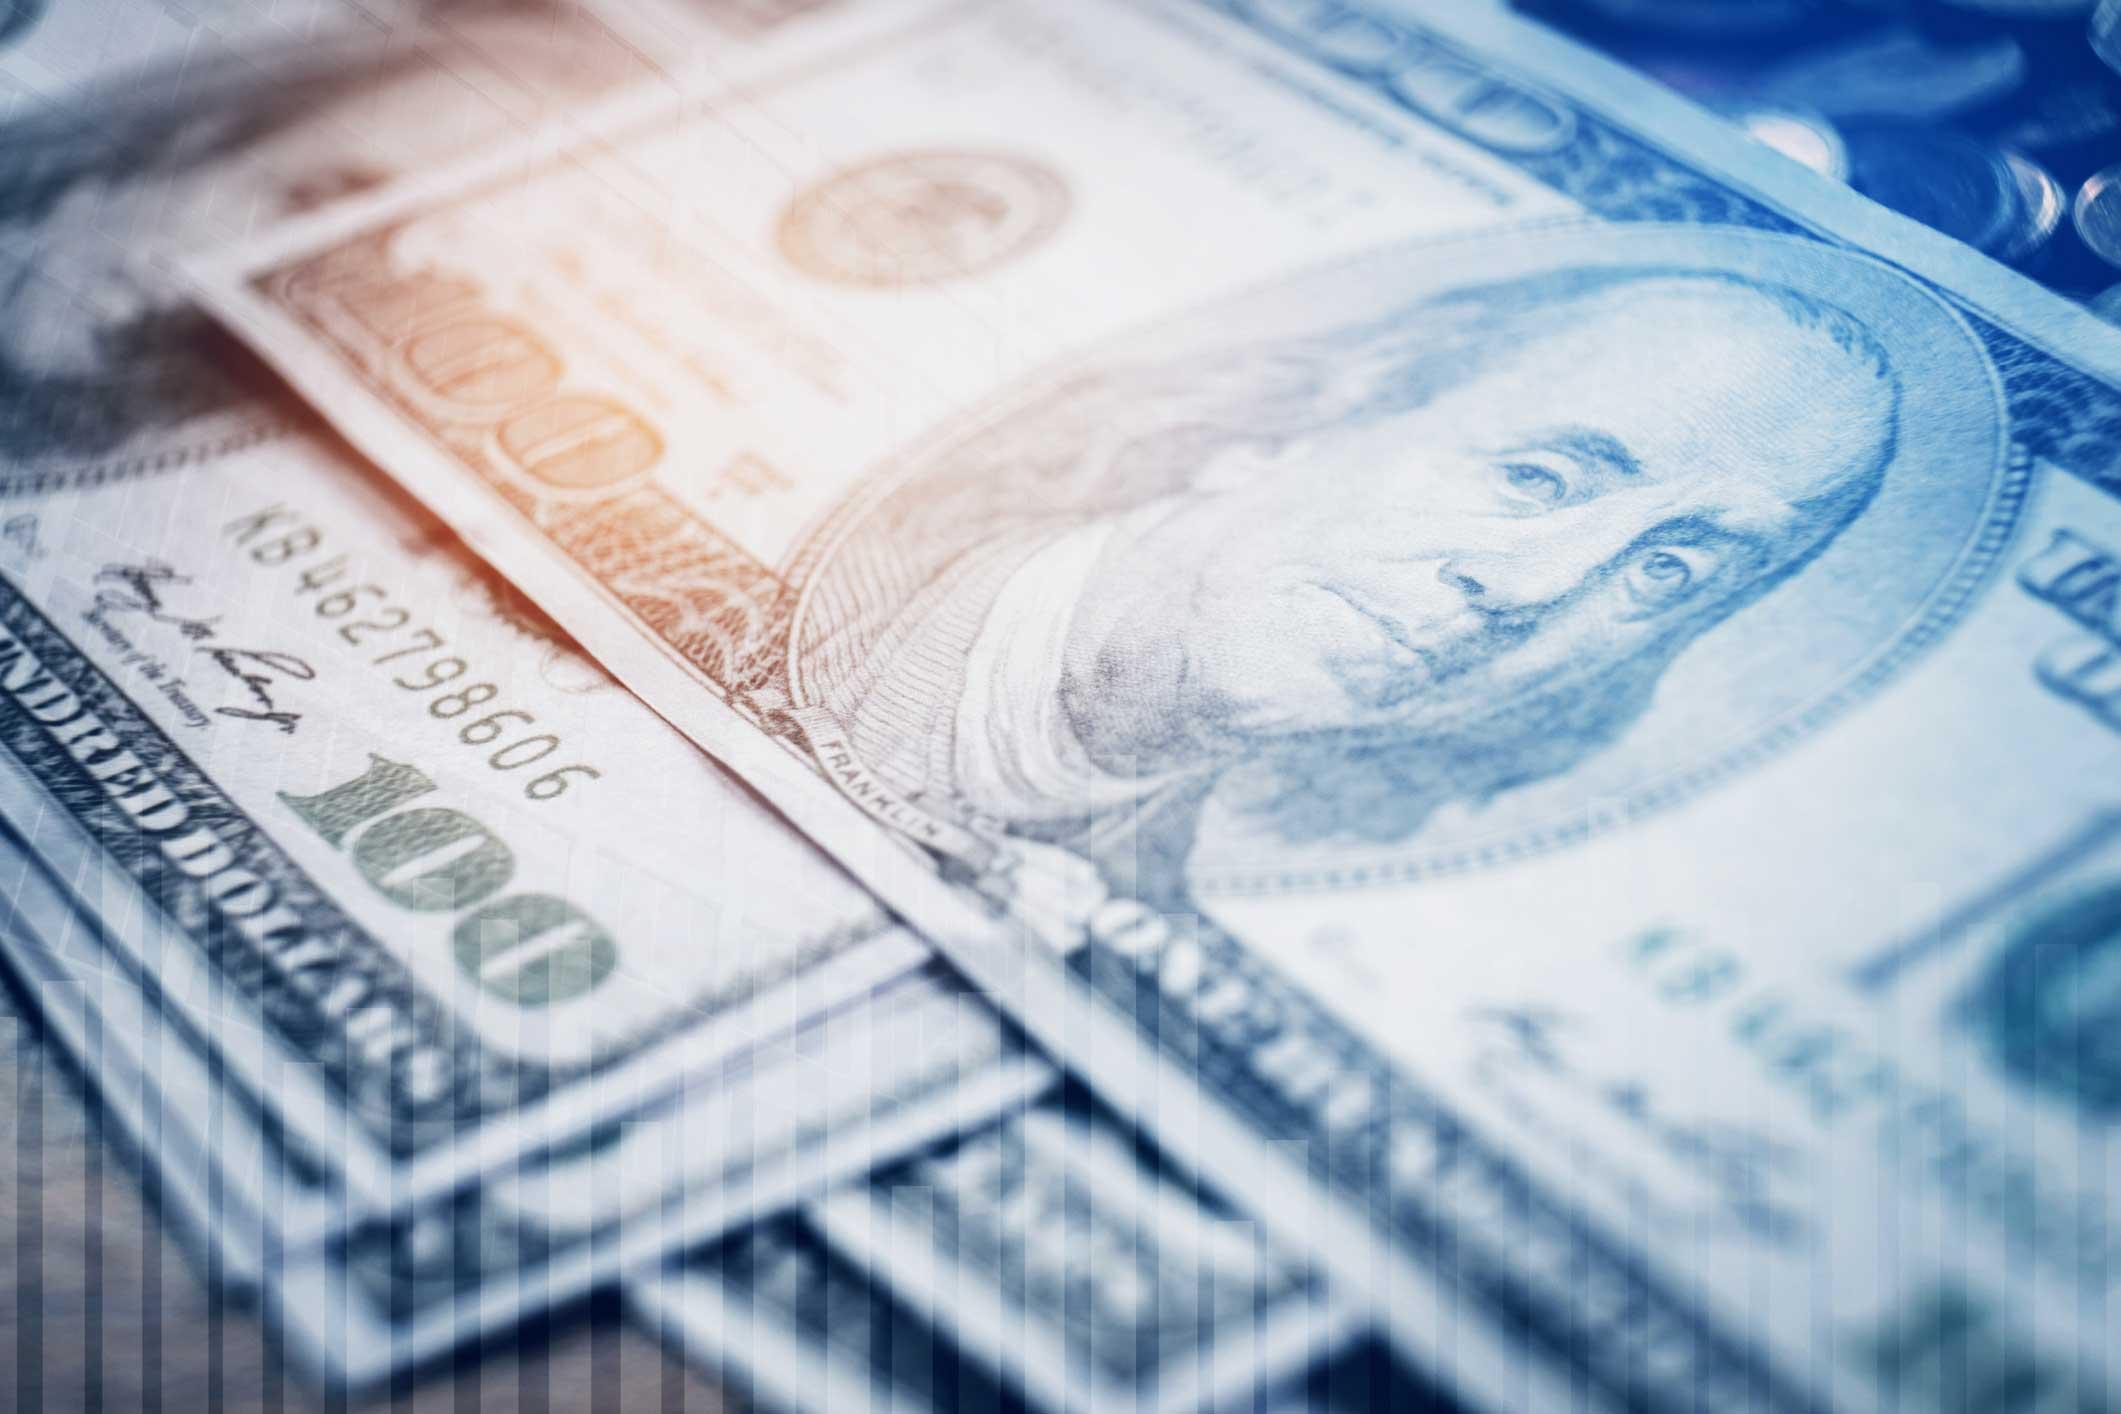 hundred dollar bills, blue background